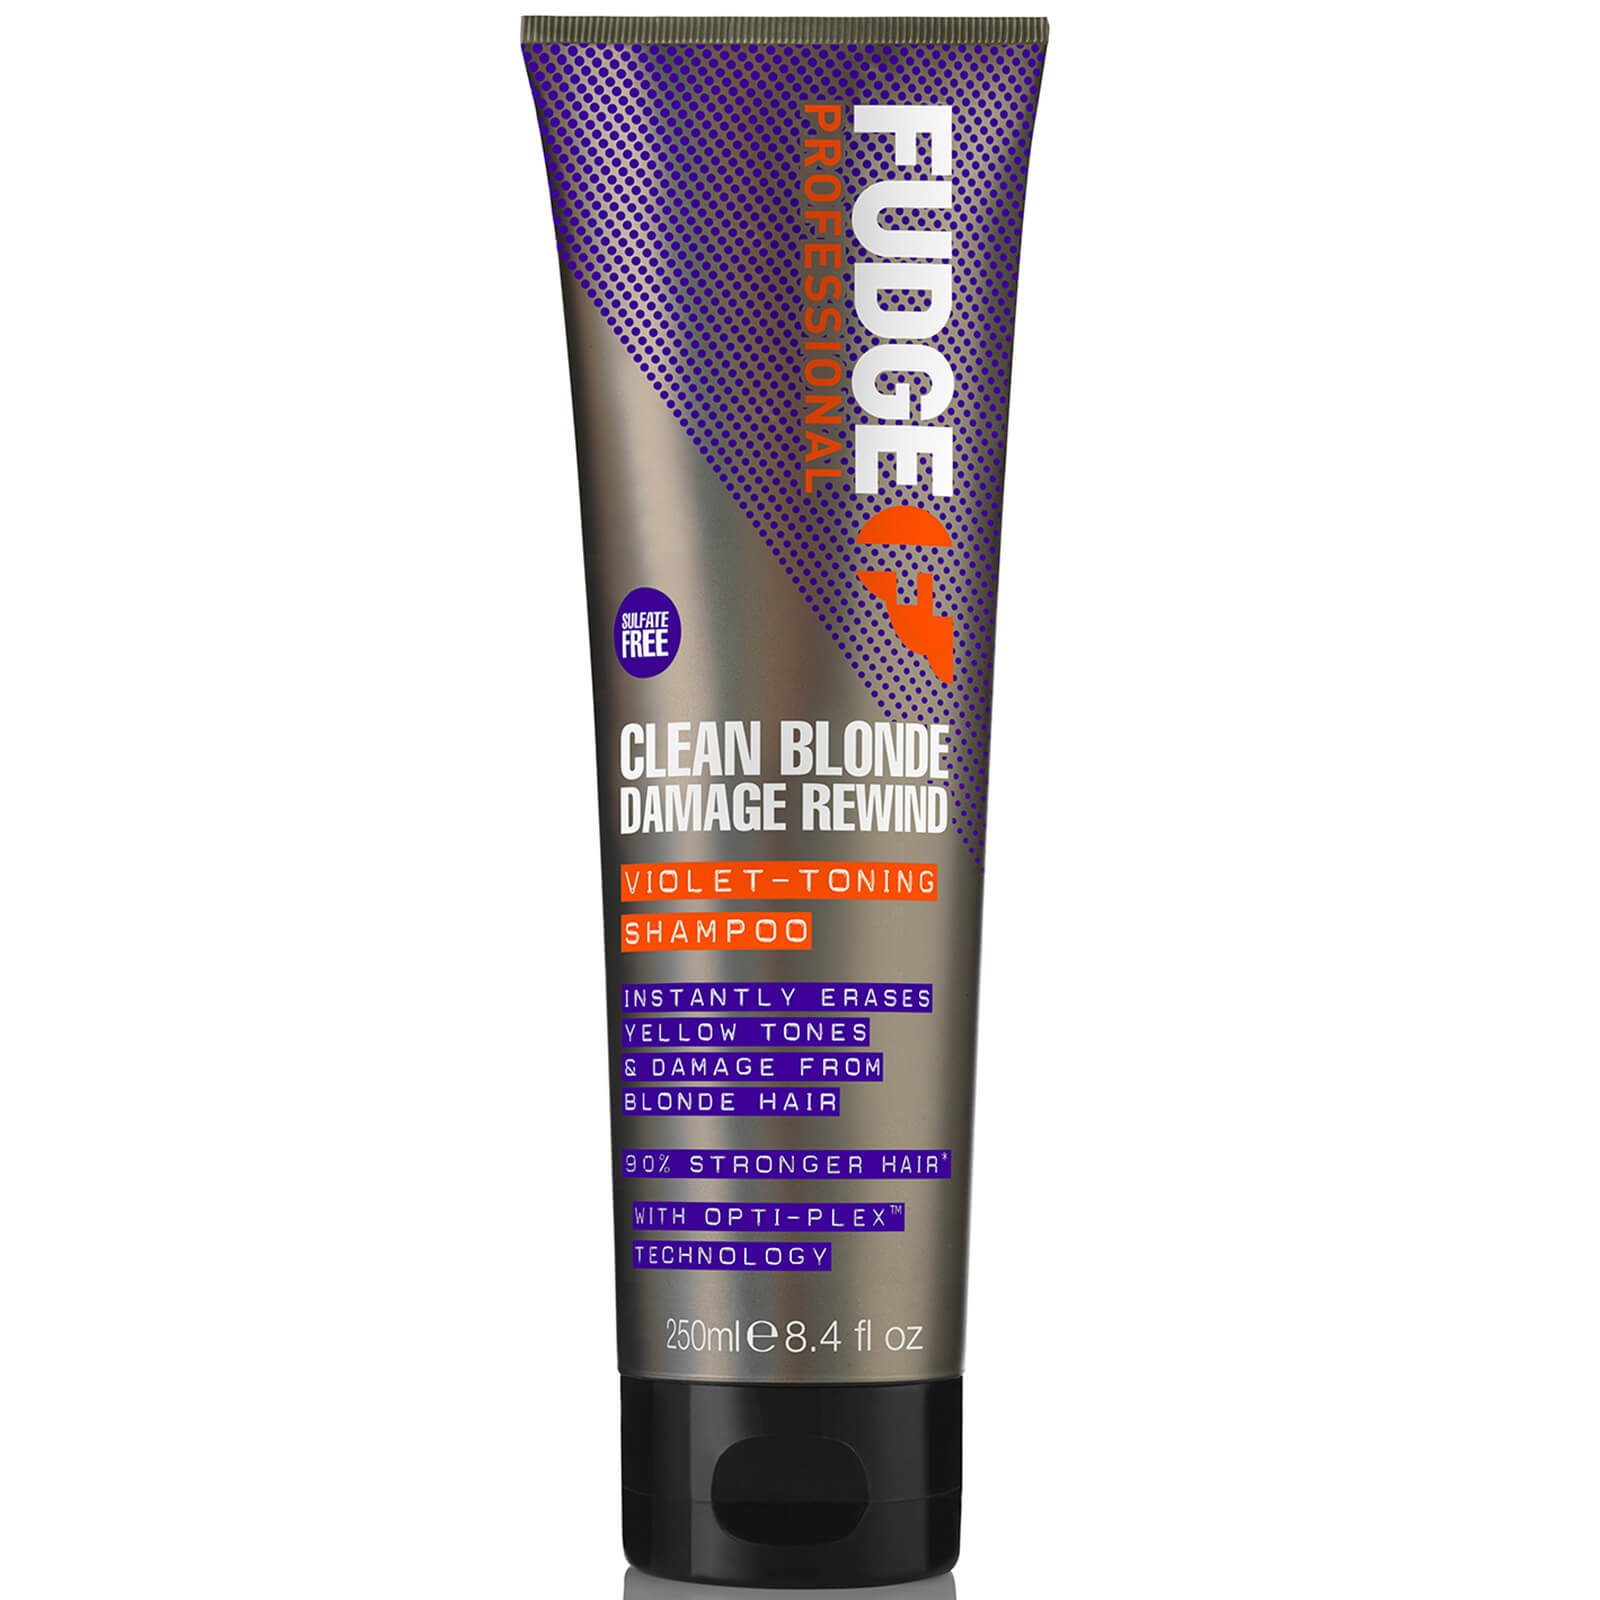 Clean Blonde Damage Rewind Violet-Toning Shampoo